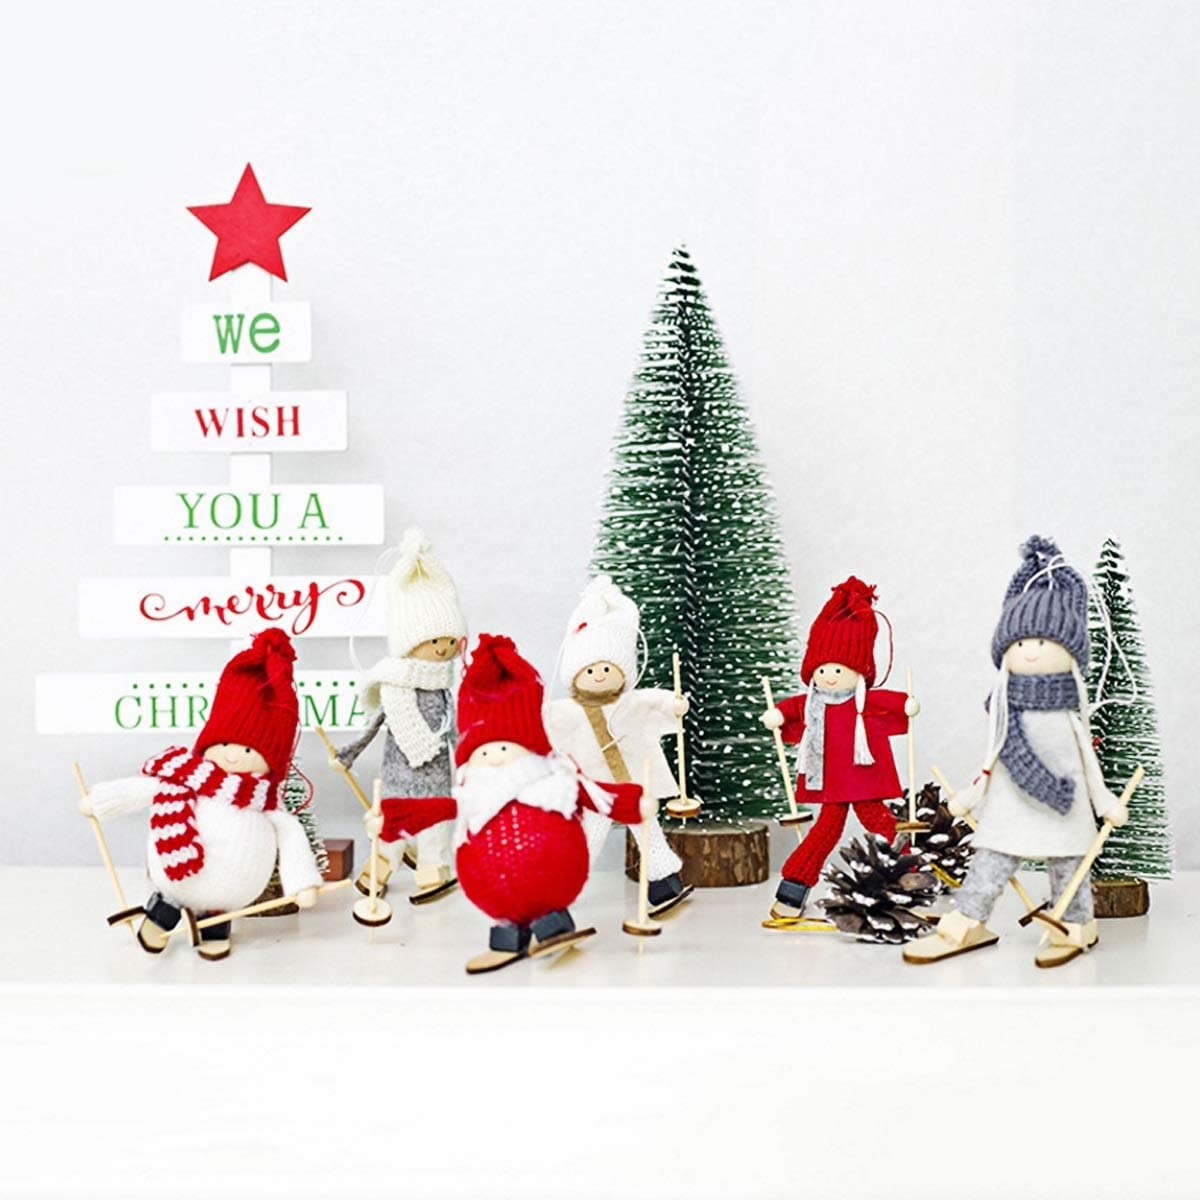 Mini Christmas Ornaments Skiing Snowman Doll Xmas Tree Hanging Decor For Home Bar Shop Gift Christmas Collection Color 5 Amazon Co Uk Kitchen Home